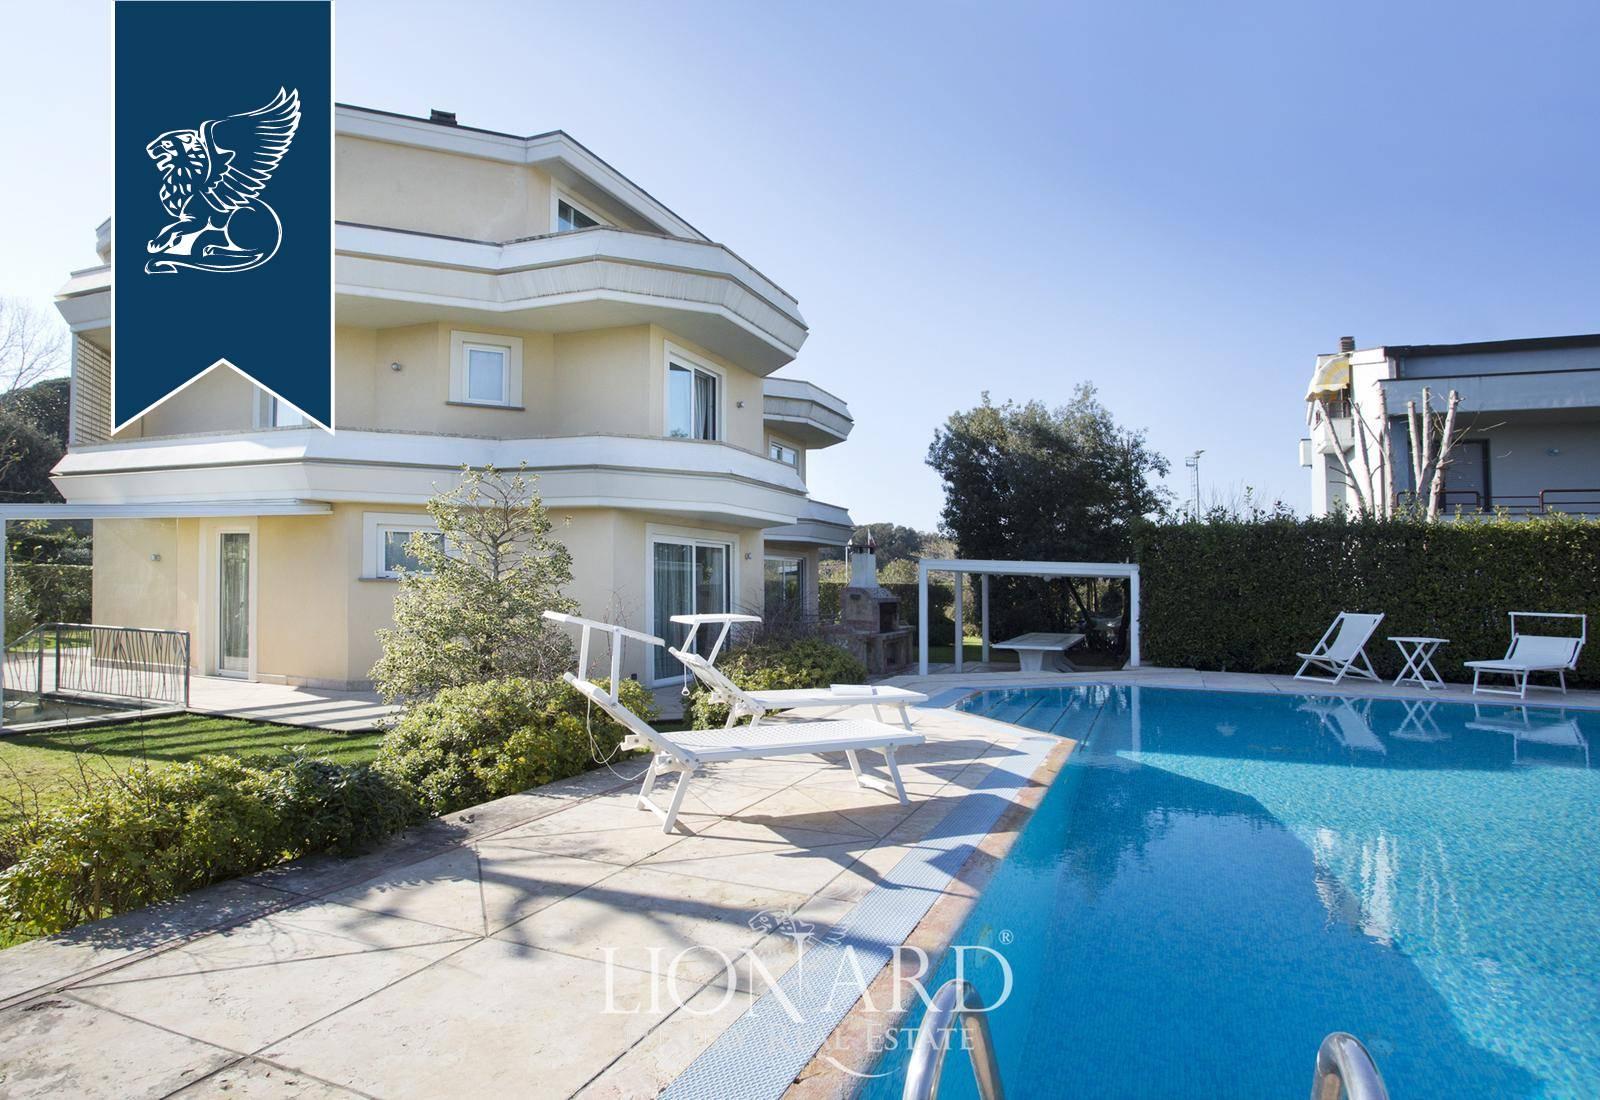 Villa in Vendita a Camaiore: 0 locali, 600 mq - Foto 4